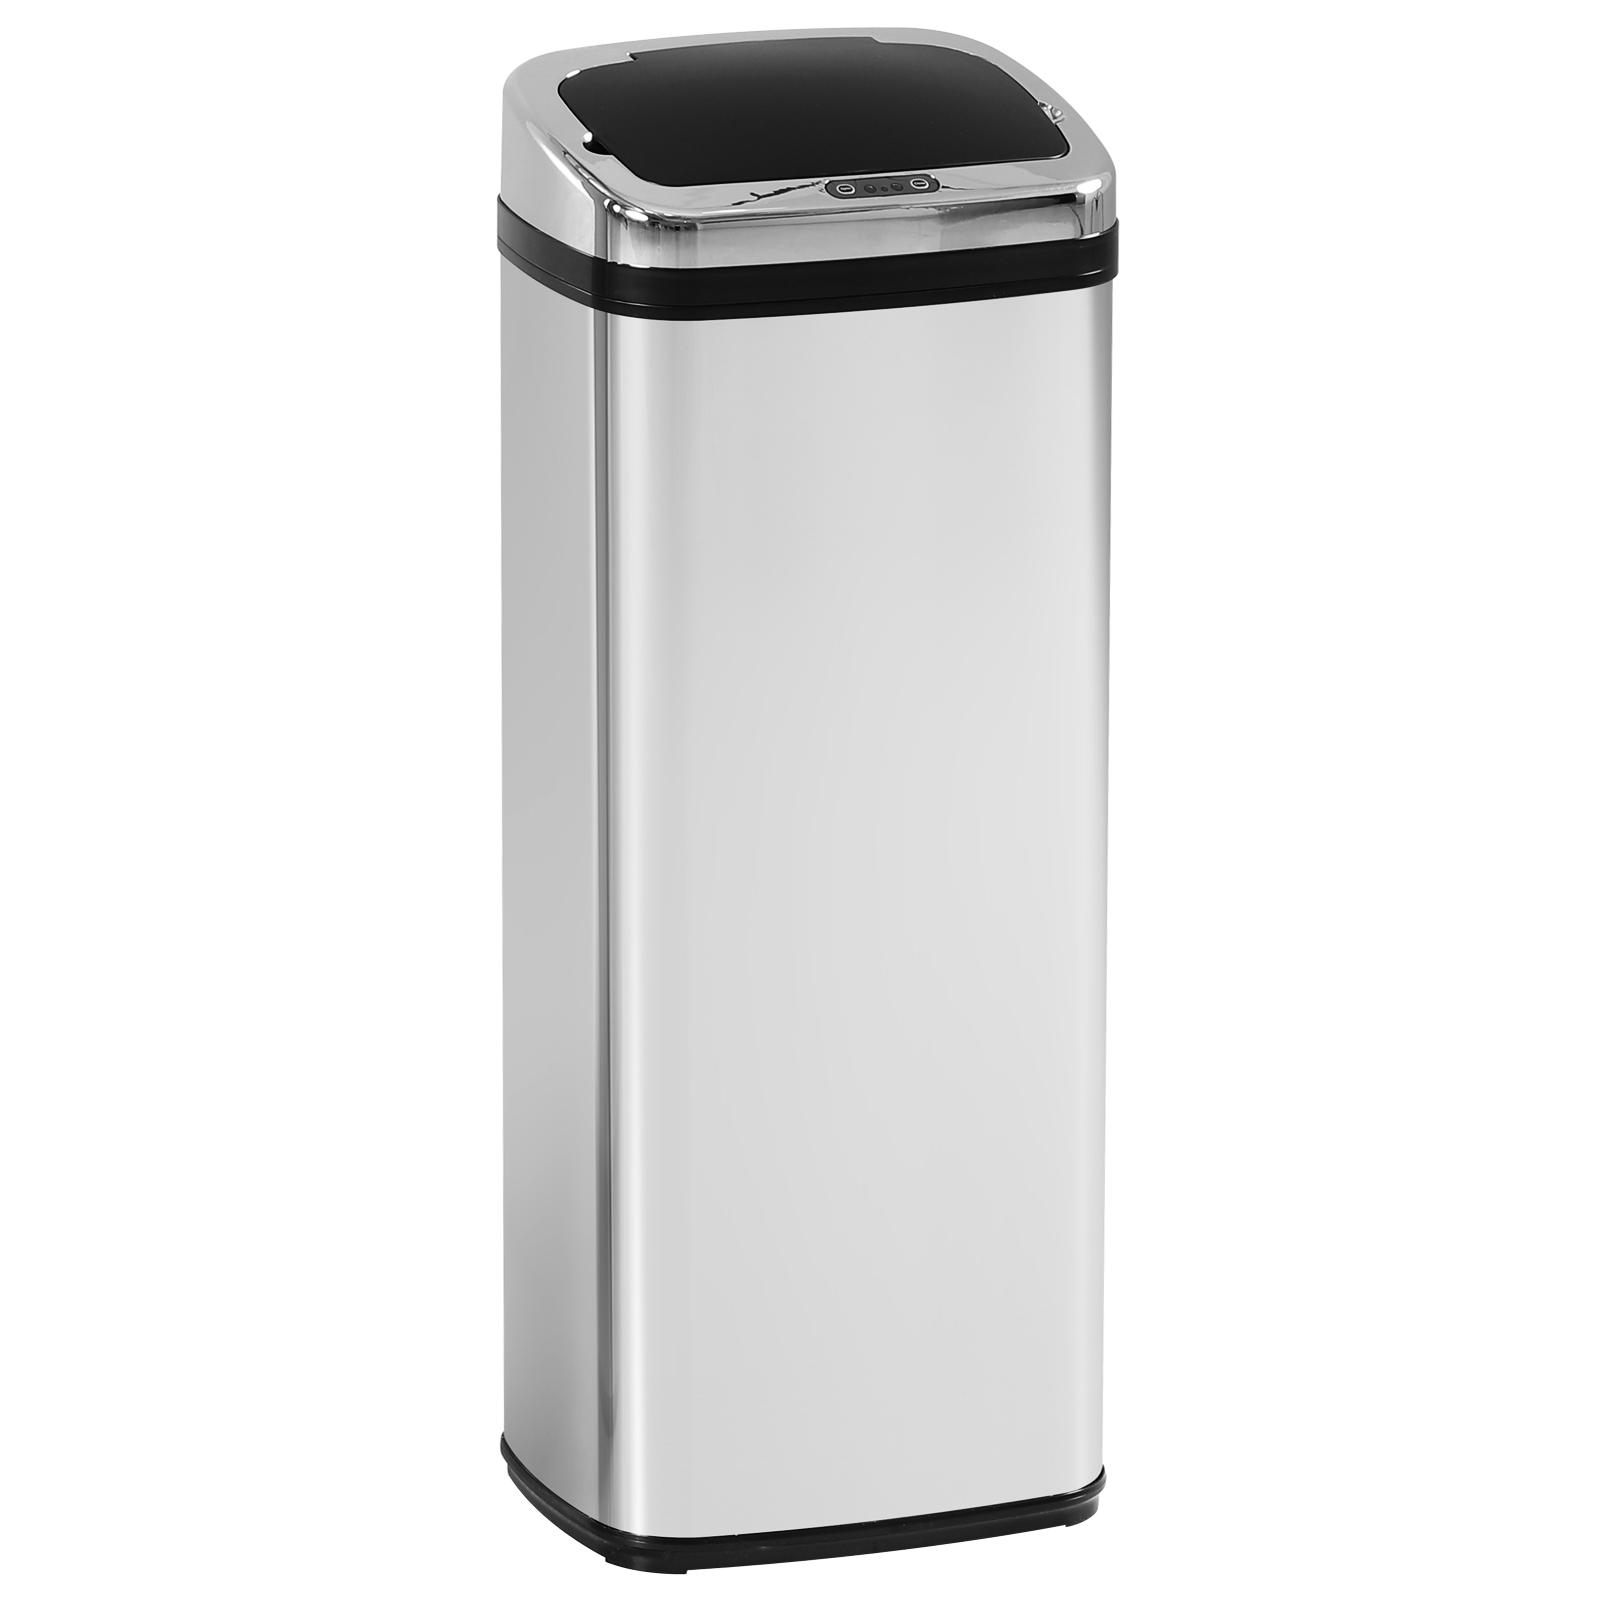 HomCom Coș de gunoi Pătrat din Inox cu Senzor automat, 50L imagine aosom.ro